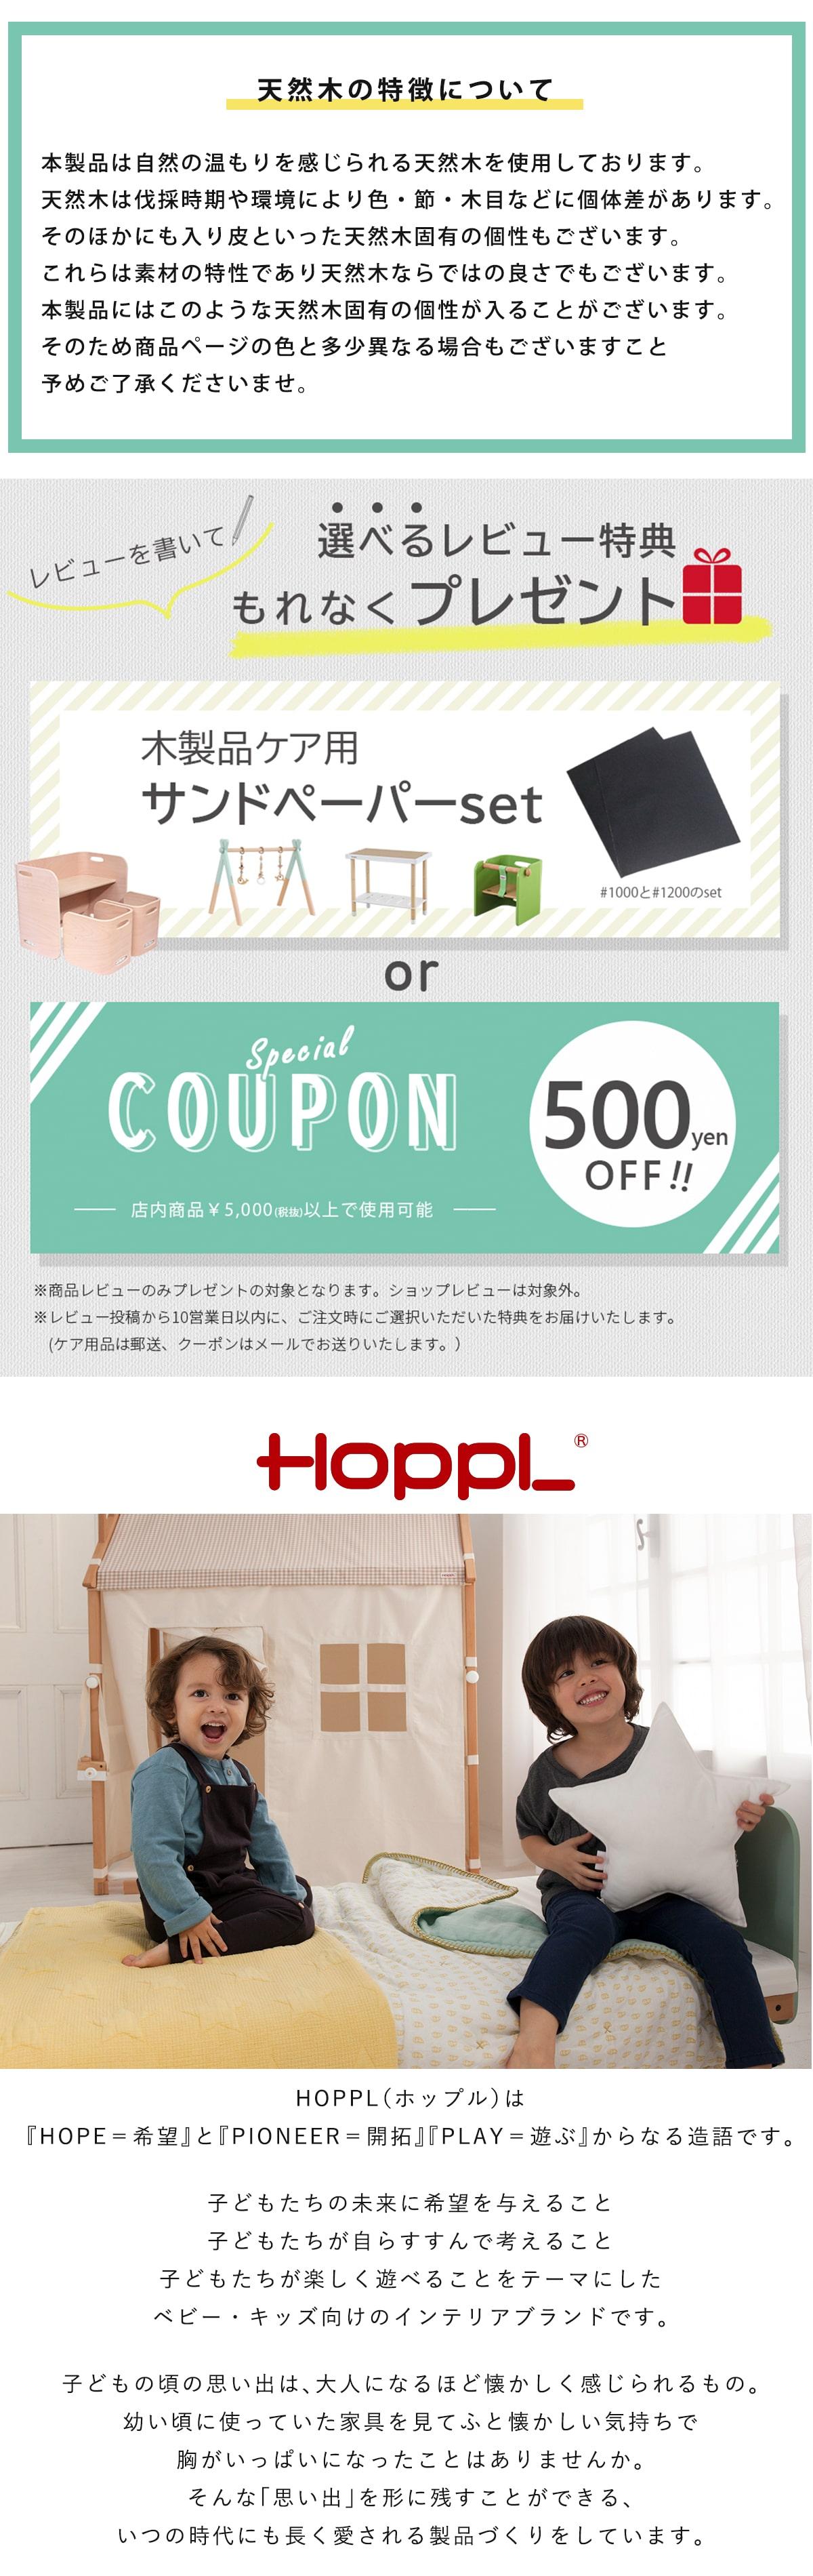 HOPPL_ブランドコンセプト